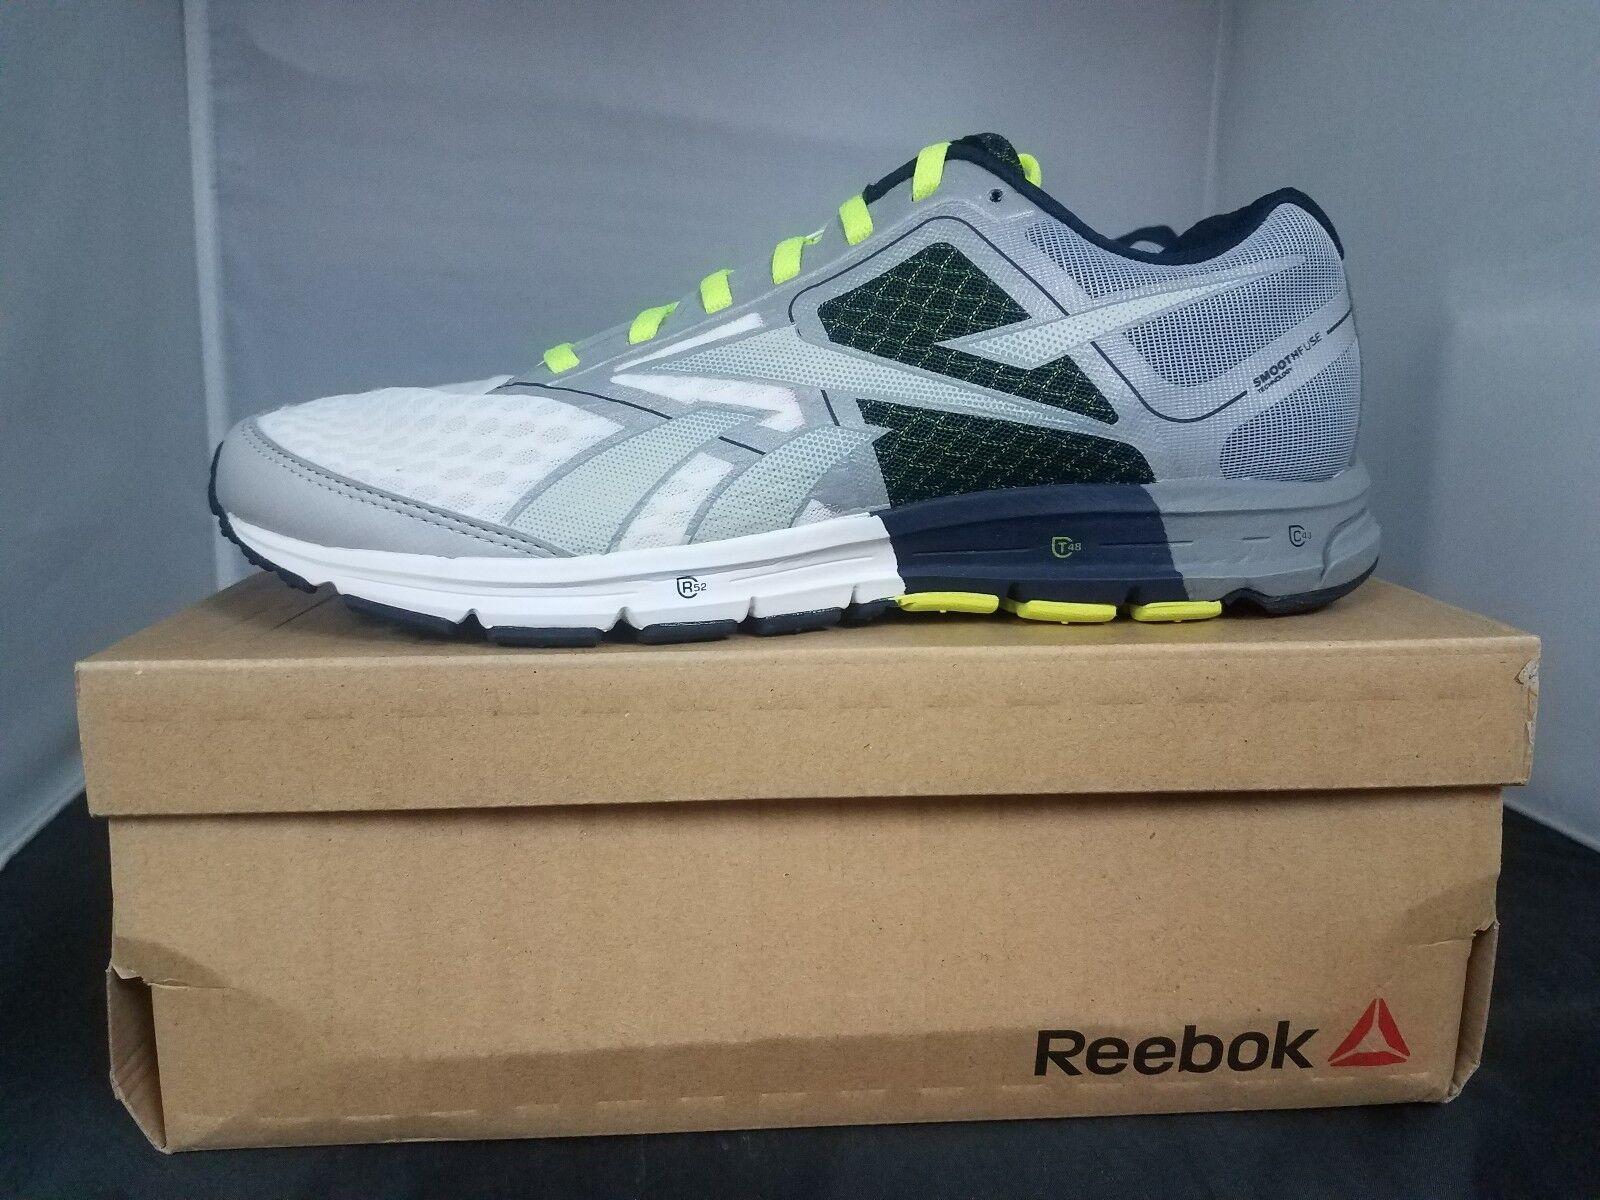 Reebok One amortiguador Running Zapatillas de Moda Acero Azul Marino gris amarillo negro Nuevo Para Hombres